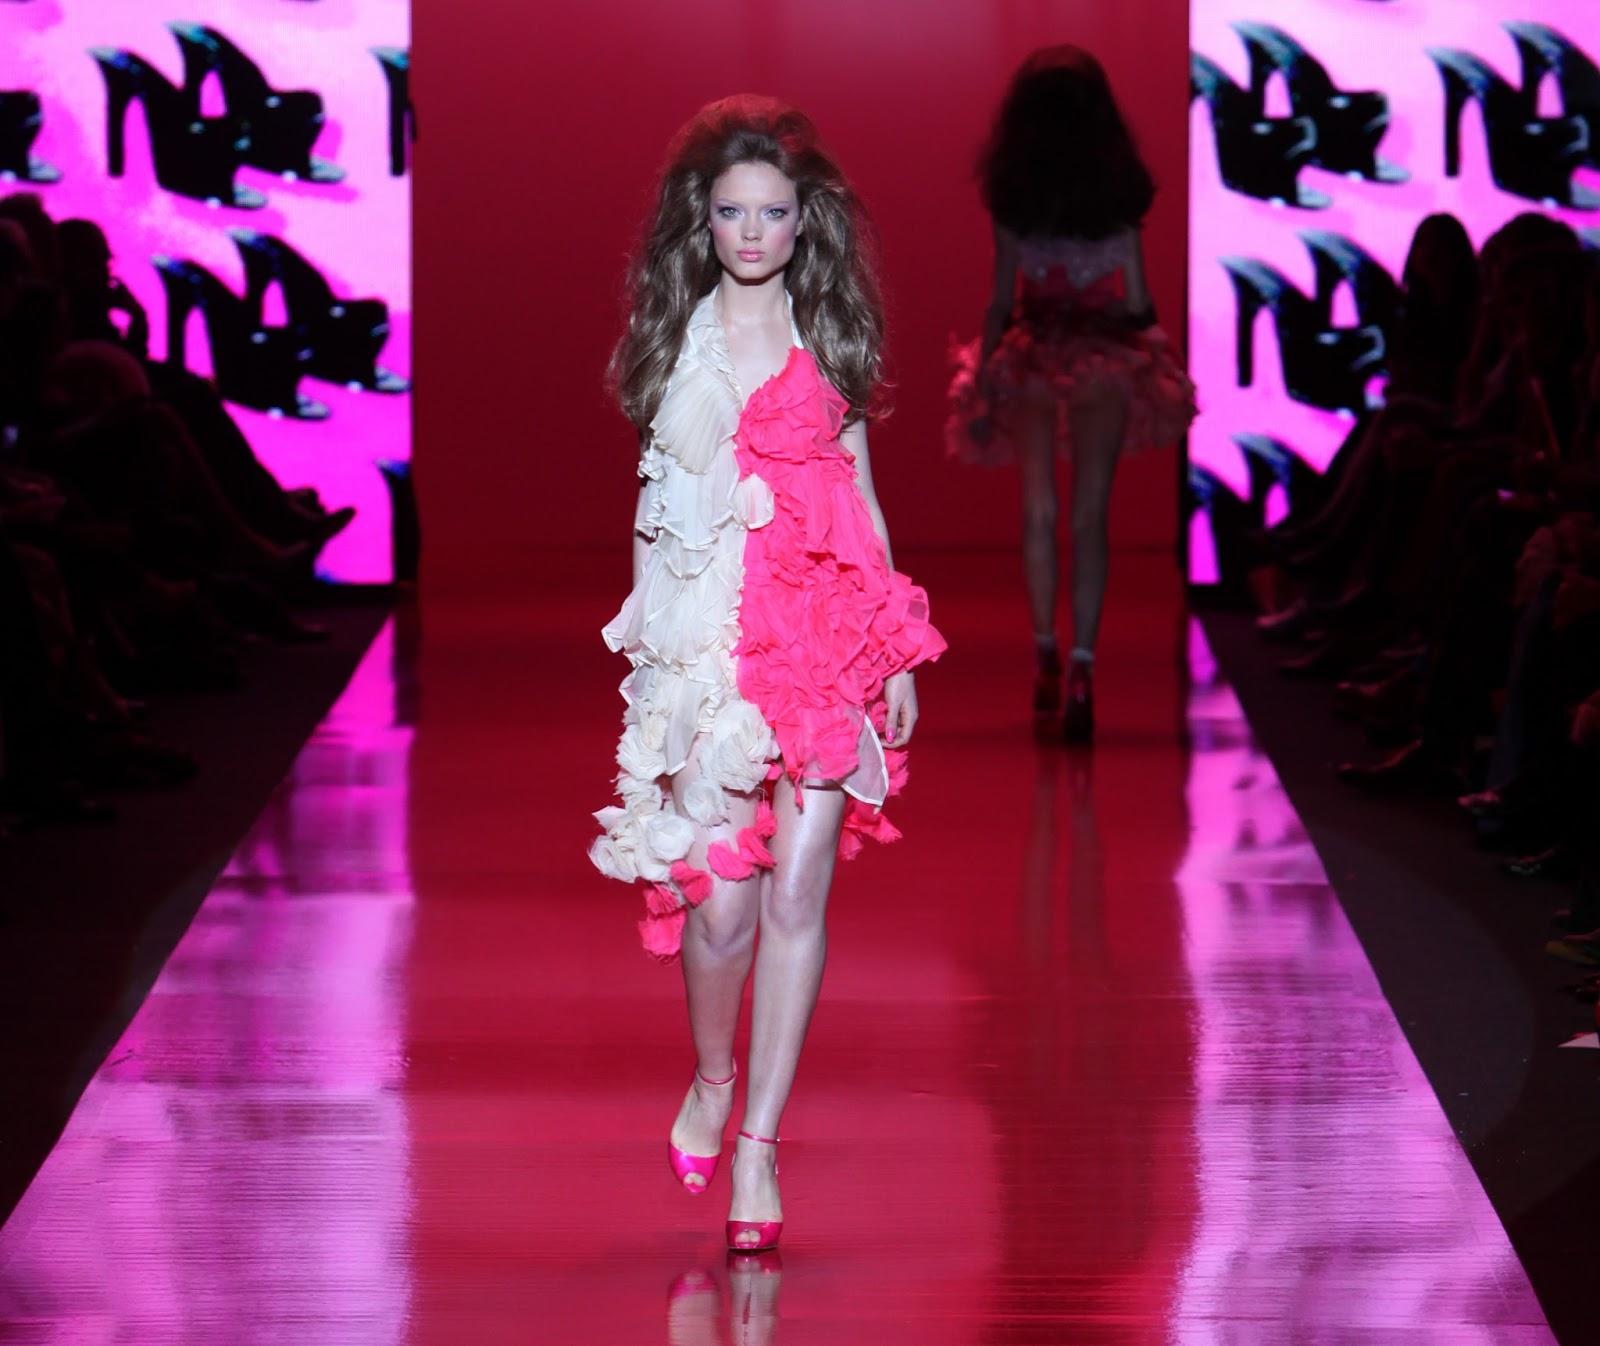 Beauty 2 Fashion: MS. FABULOUS: February 2009 Fashion Design, Indie Clothing